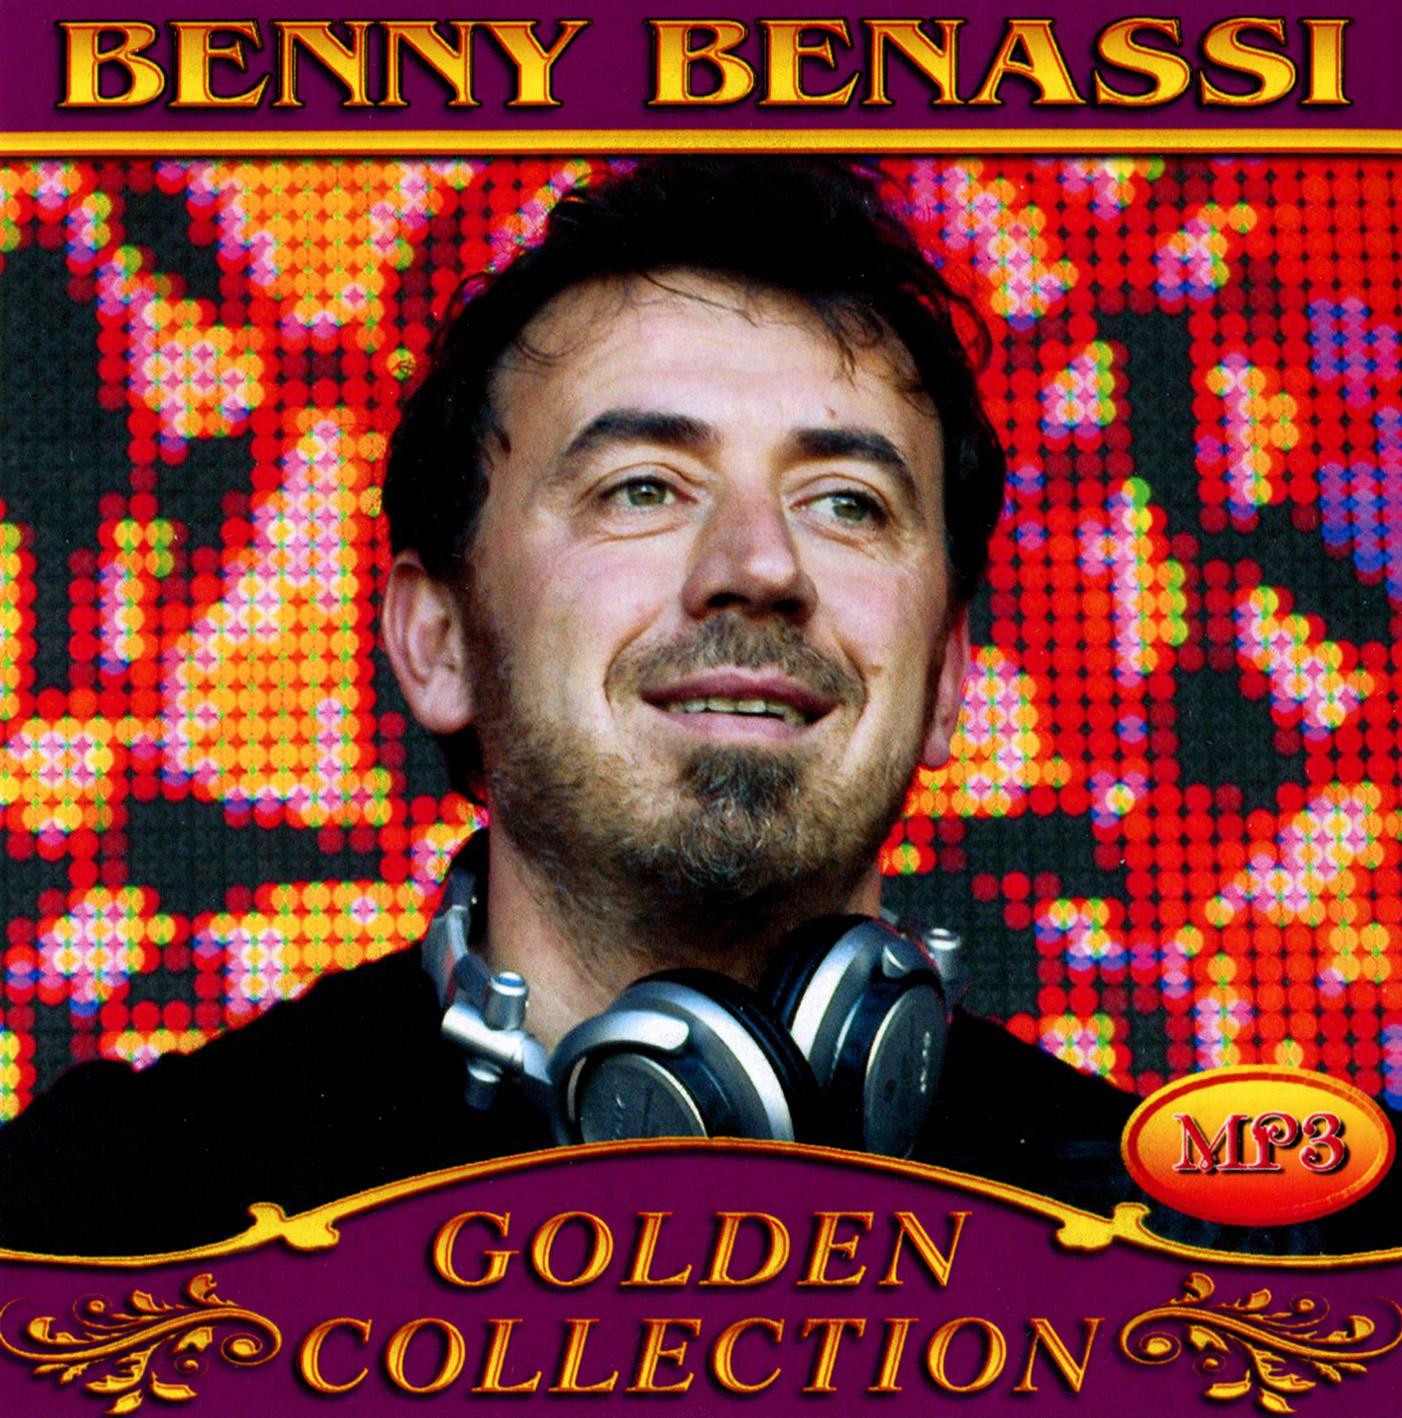 Benny Benassi [mp3]